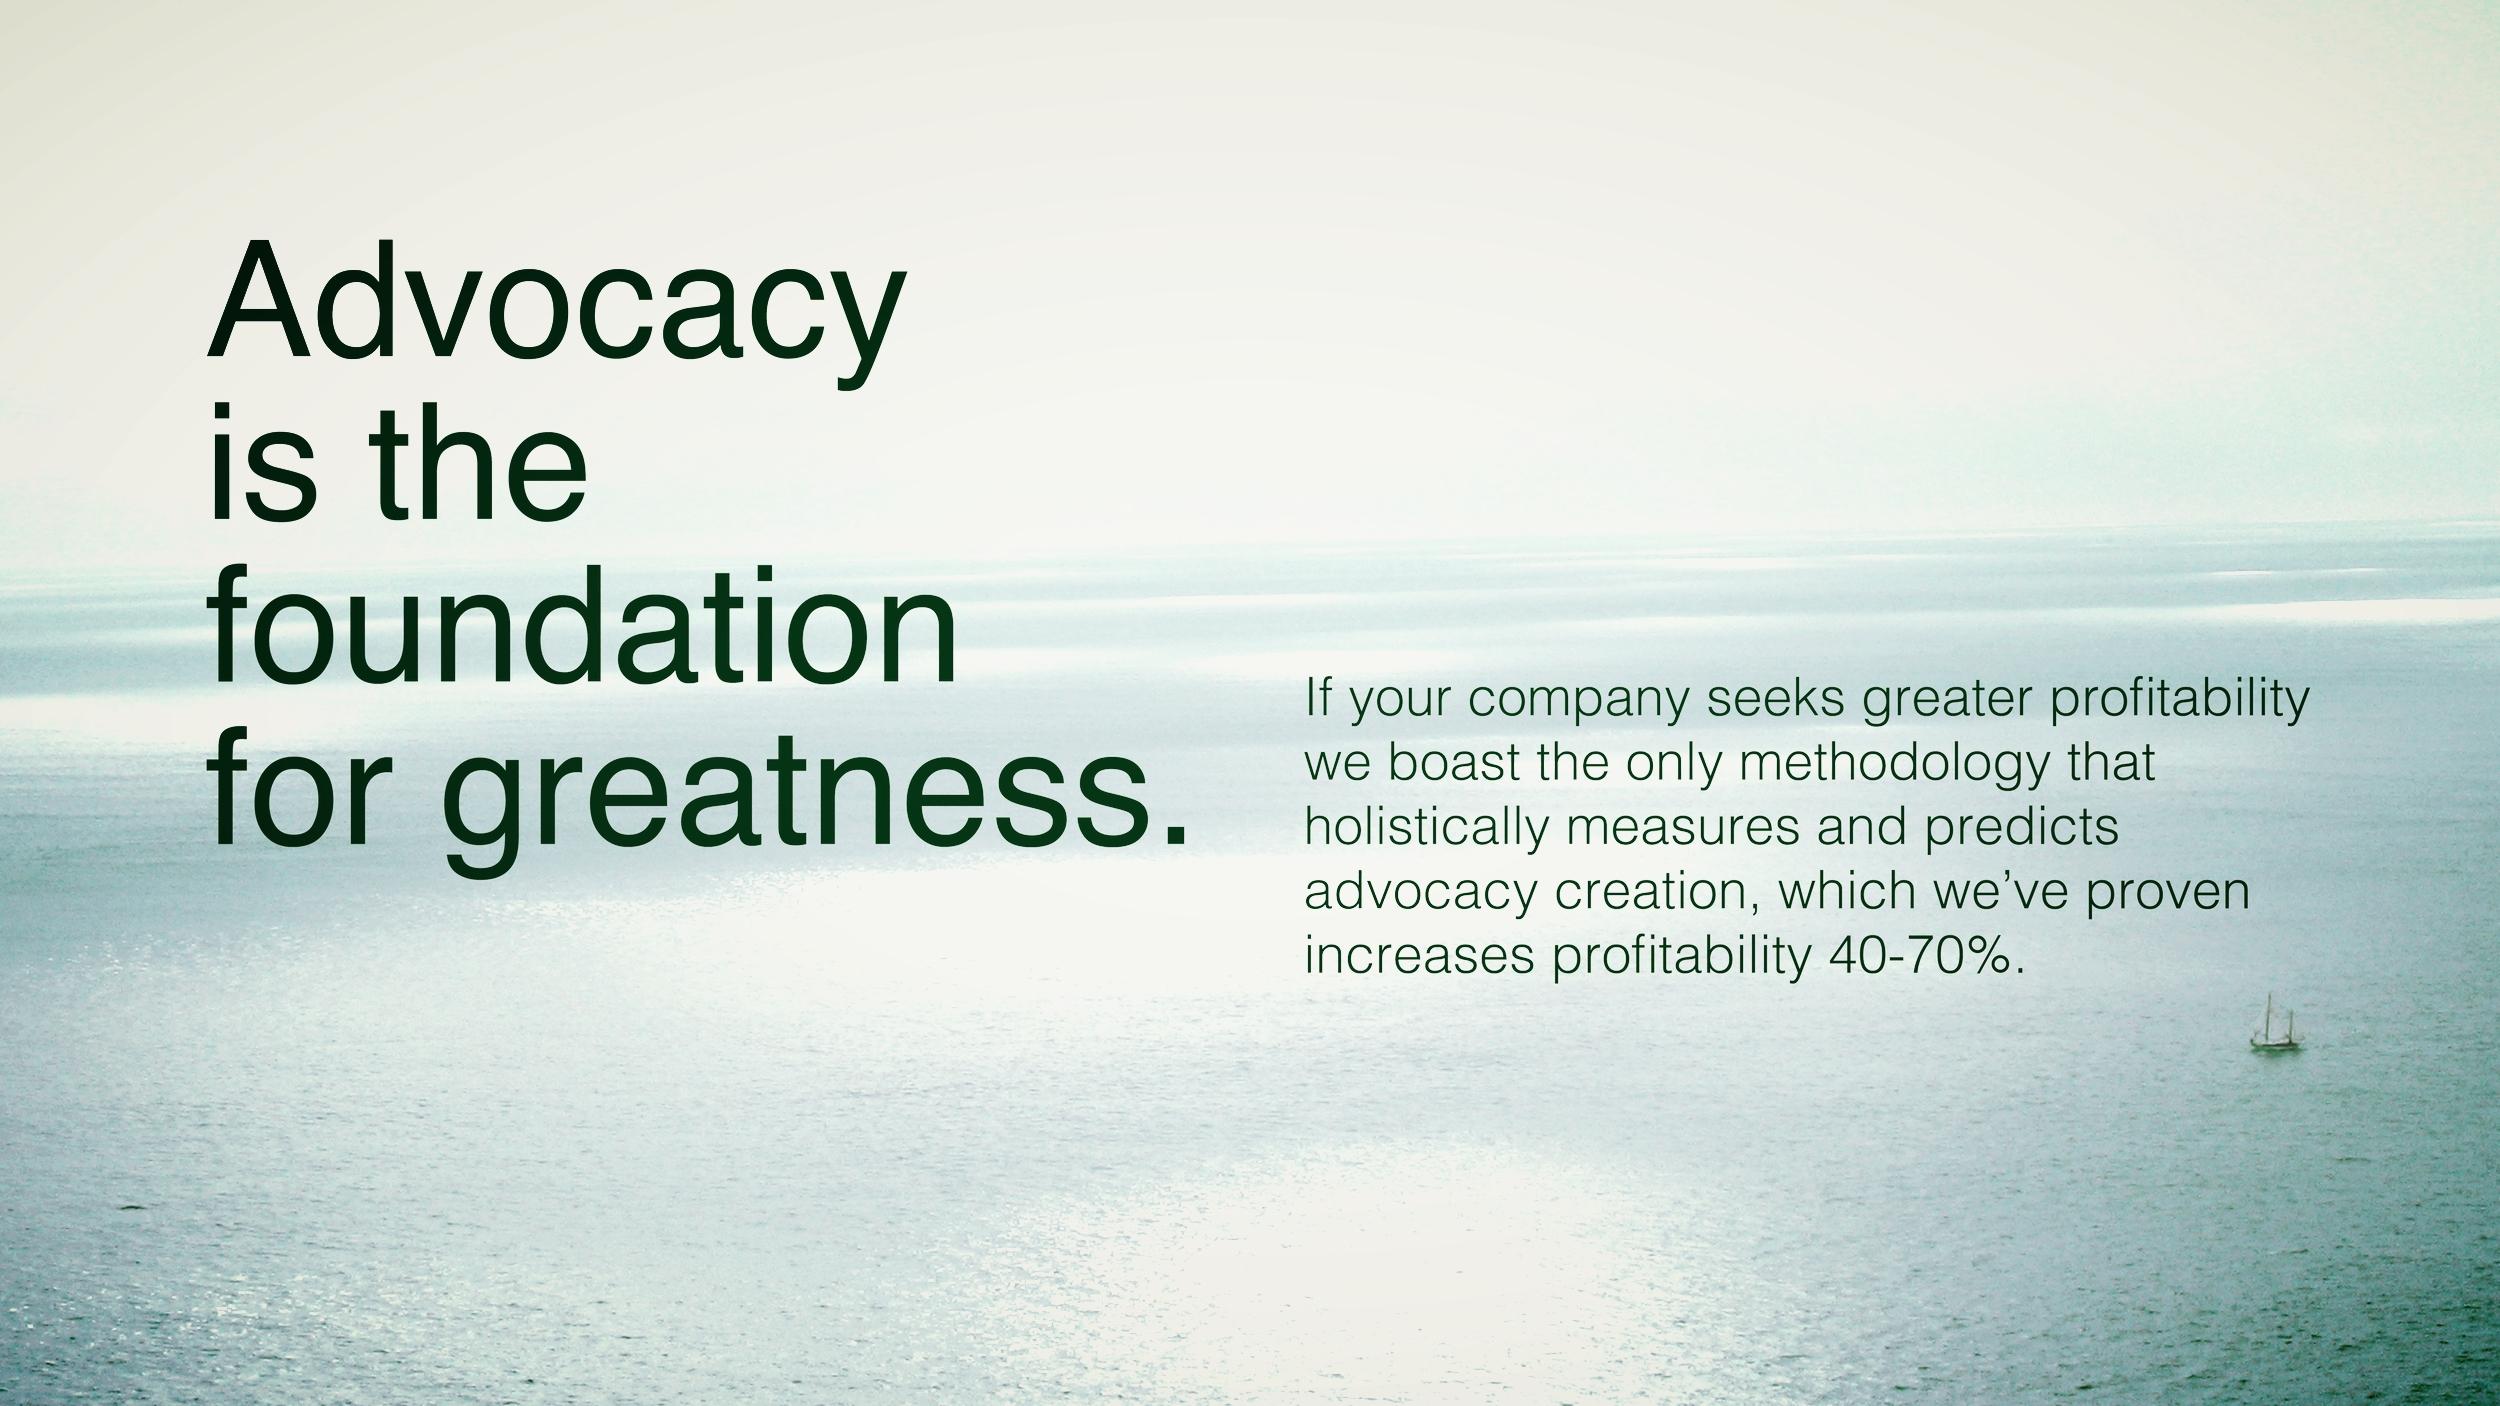 advocacy new ocean.jpg